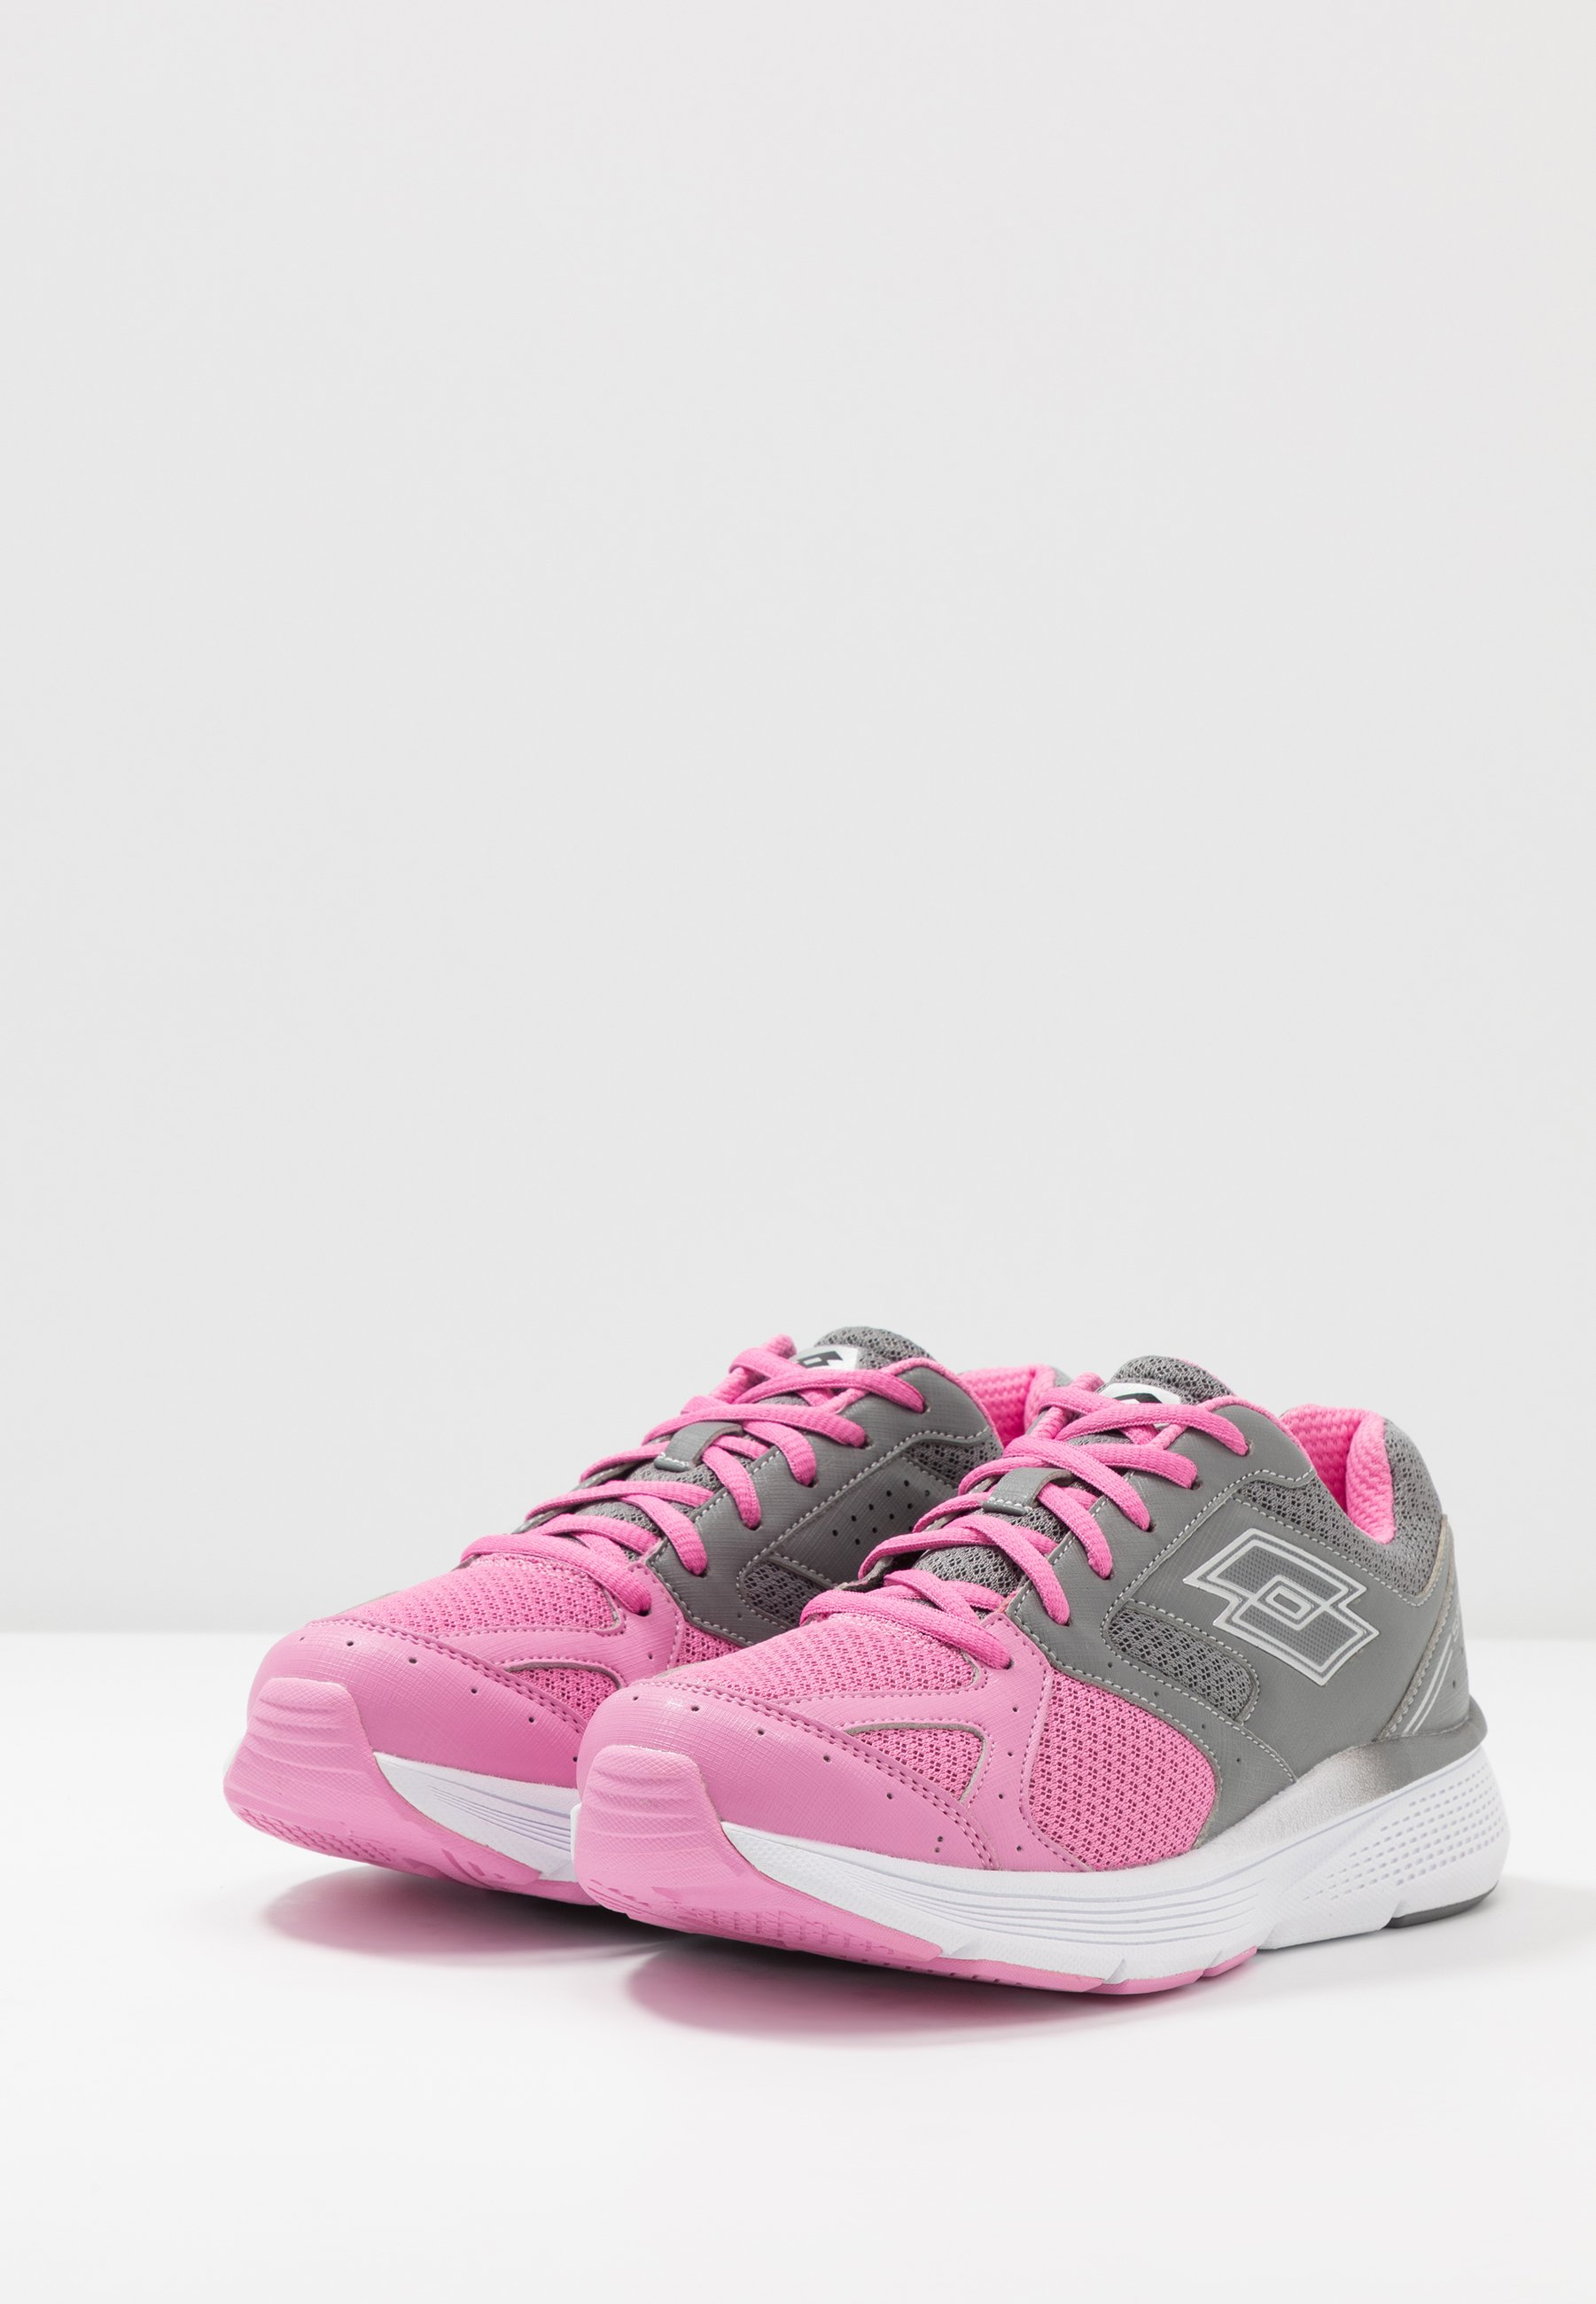 Lotto SPEEDRIDE 600 VII - Chaussures de running neutres - fuchsia pink/silver metal/cool gray